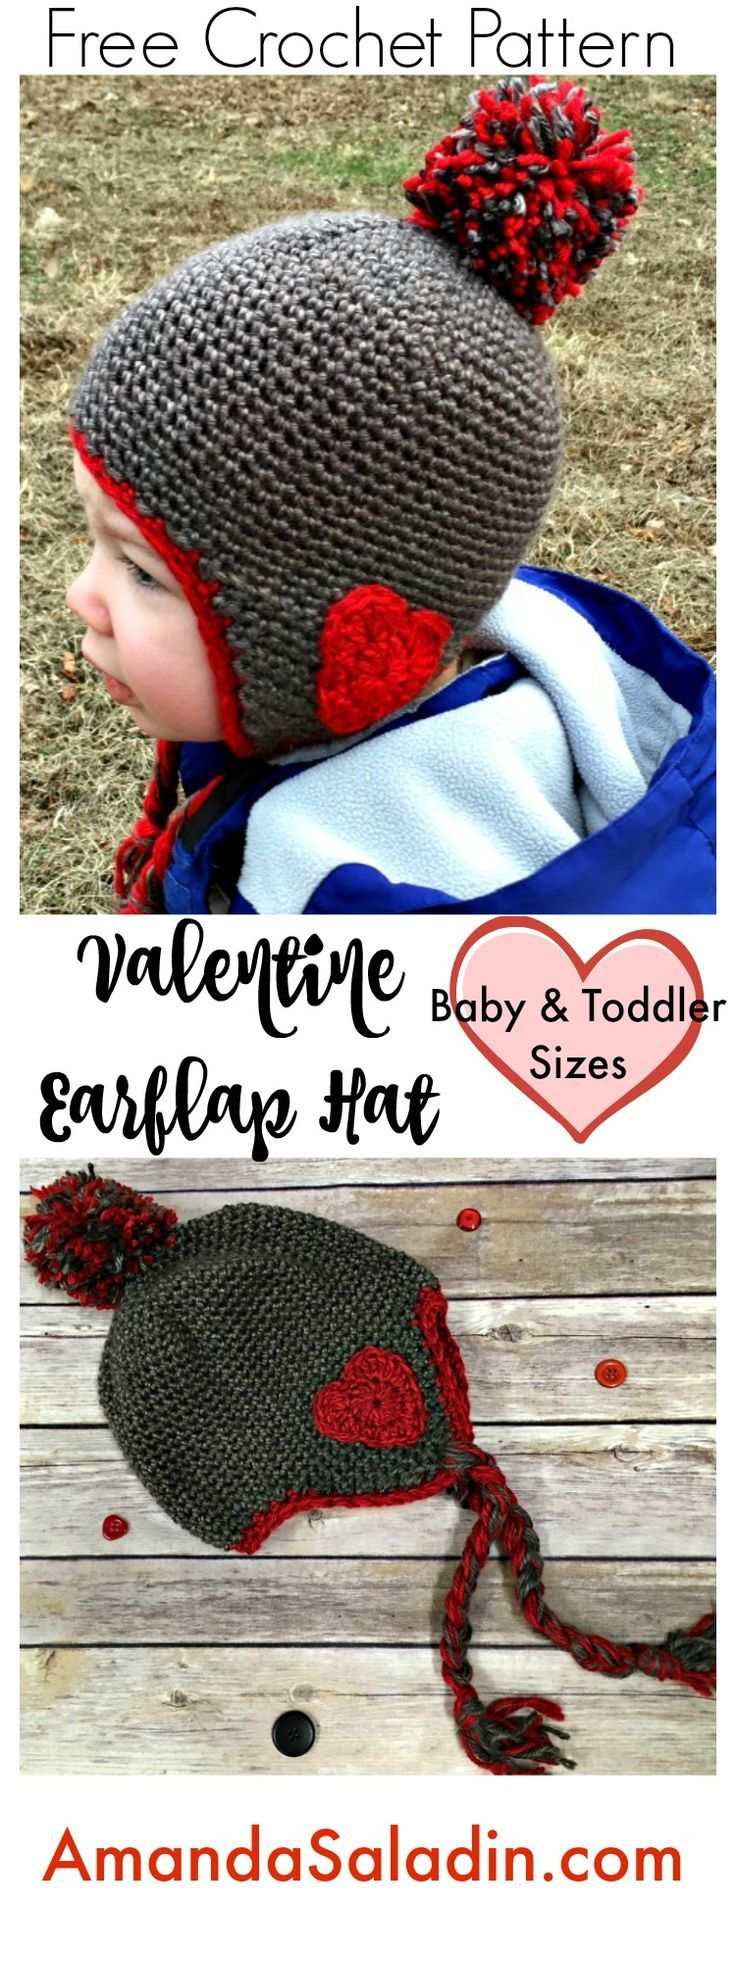 982 best Crochet - Kids Gear images on Pinterest | Crochet hats ...